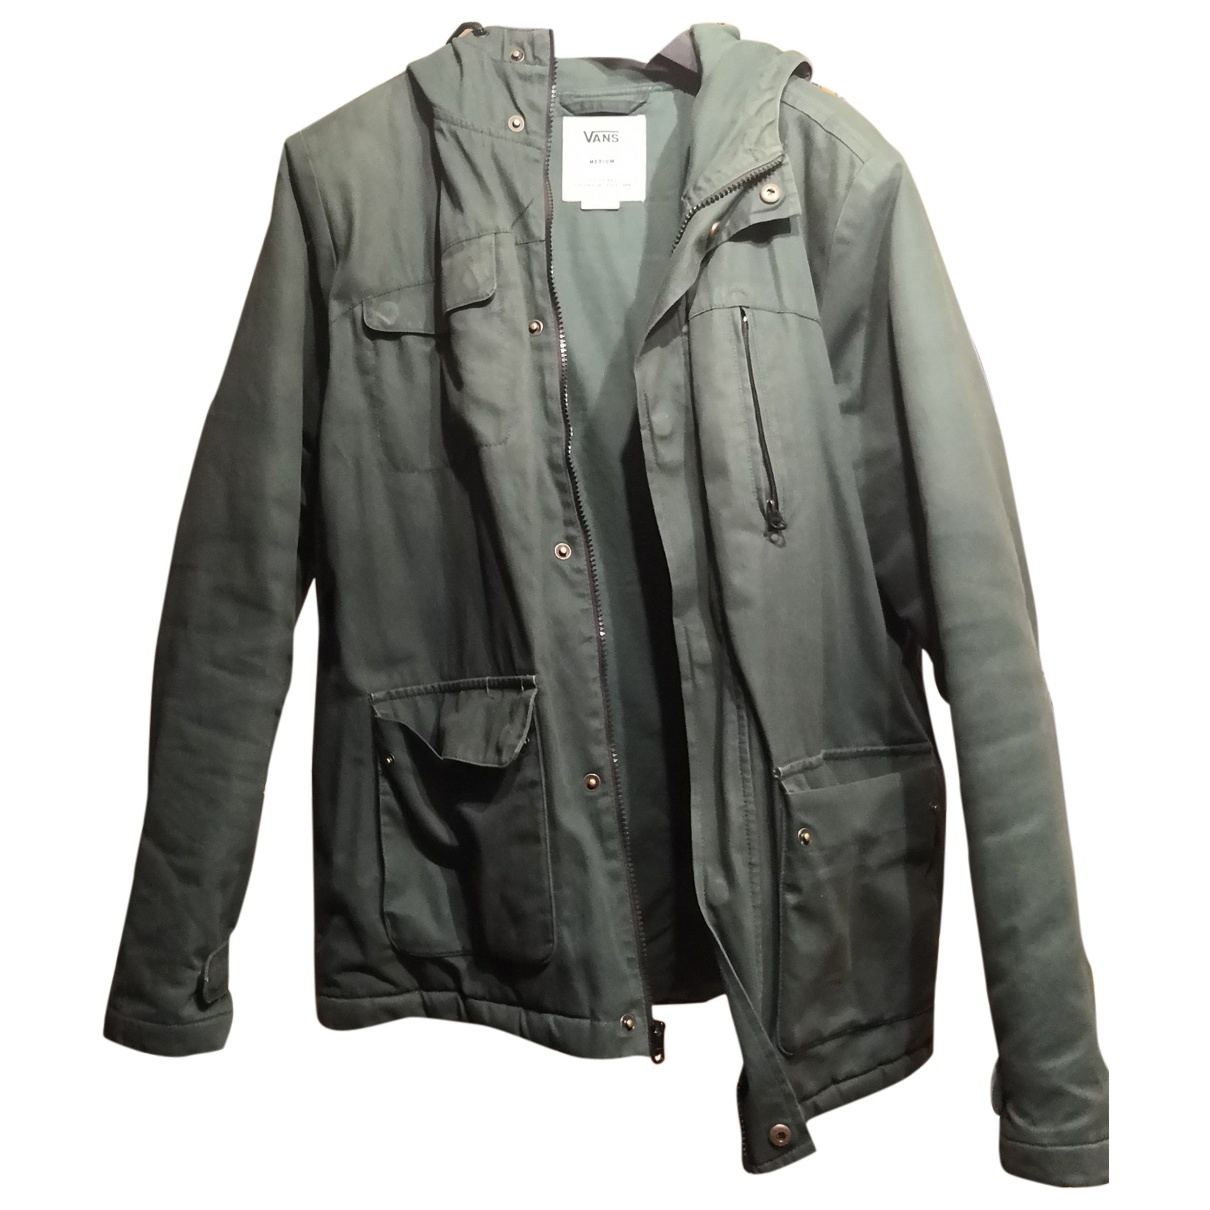 Vans \N Green jacket  for Men M International